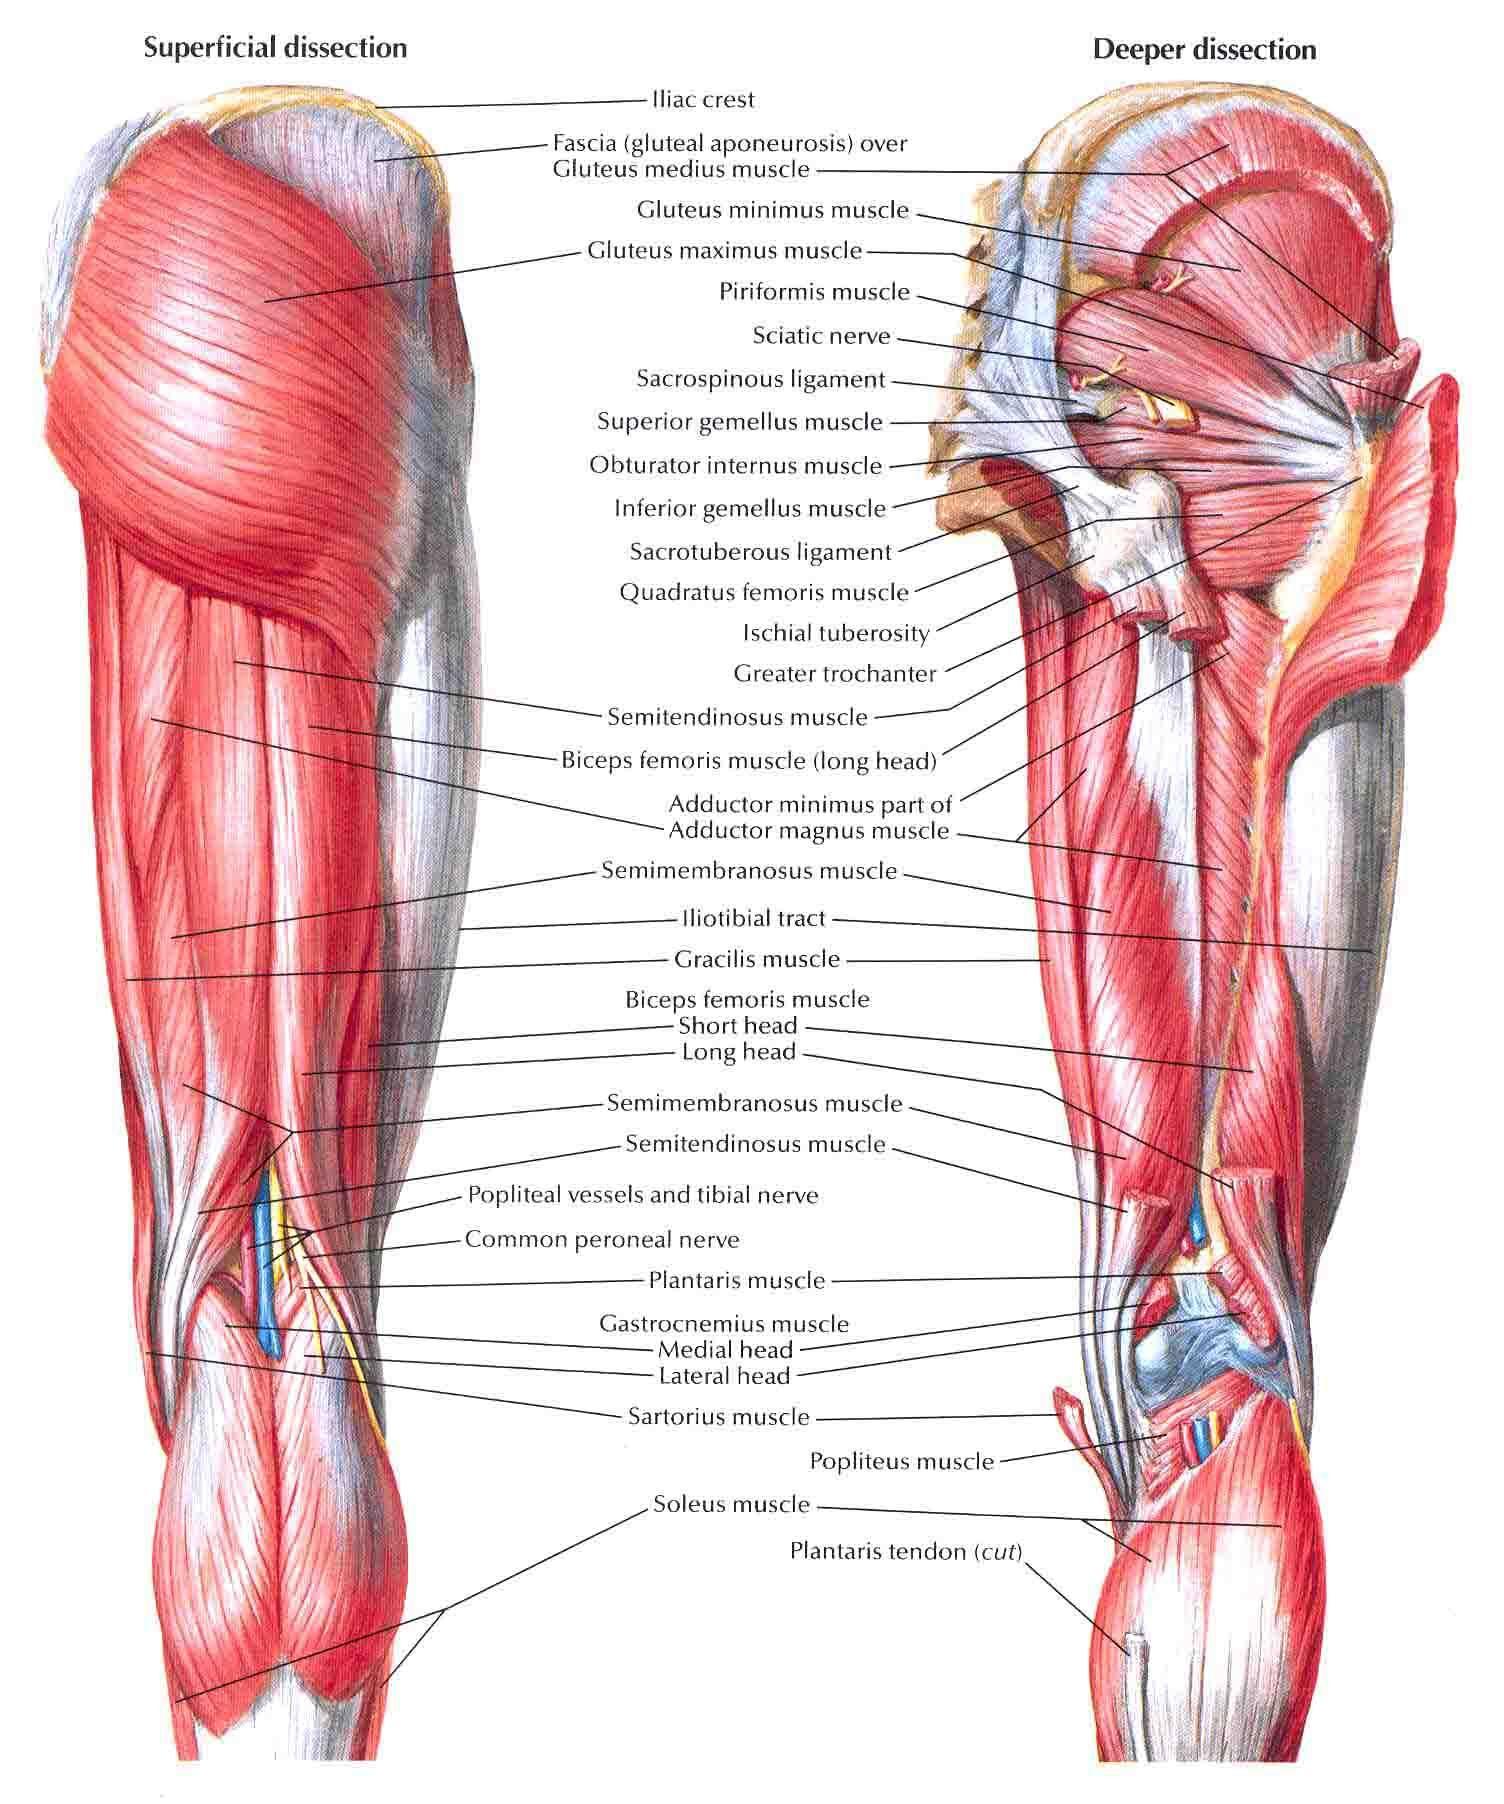 animal anatomy hip - Google Search | anatomy | Pinterest | Animal ...